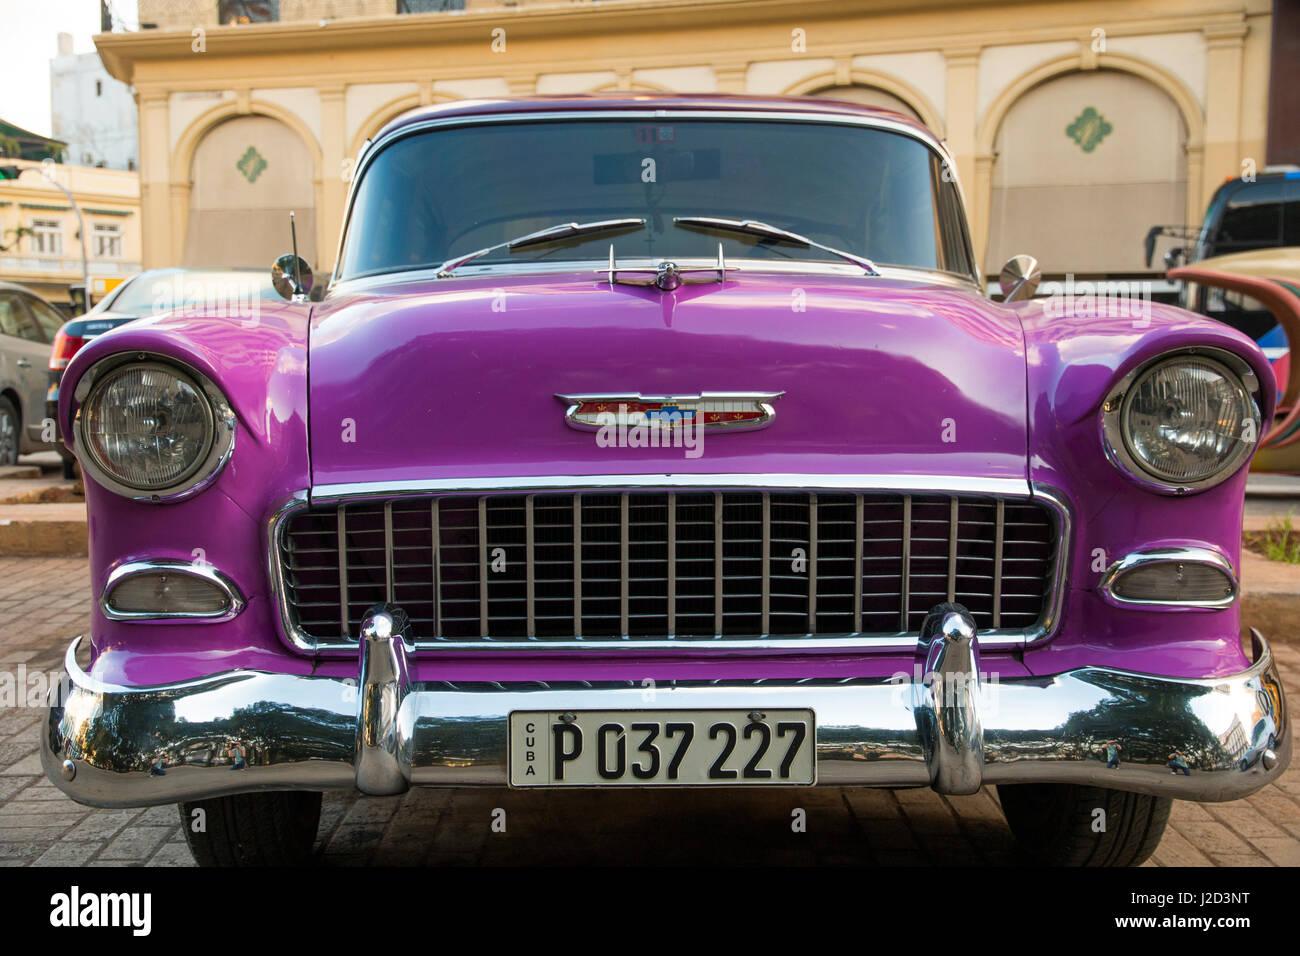 Caribbean, Cuba, Havana. 1955 Chevrolet Bel Air. Collectible ...